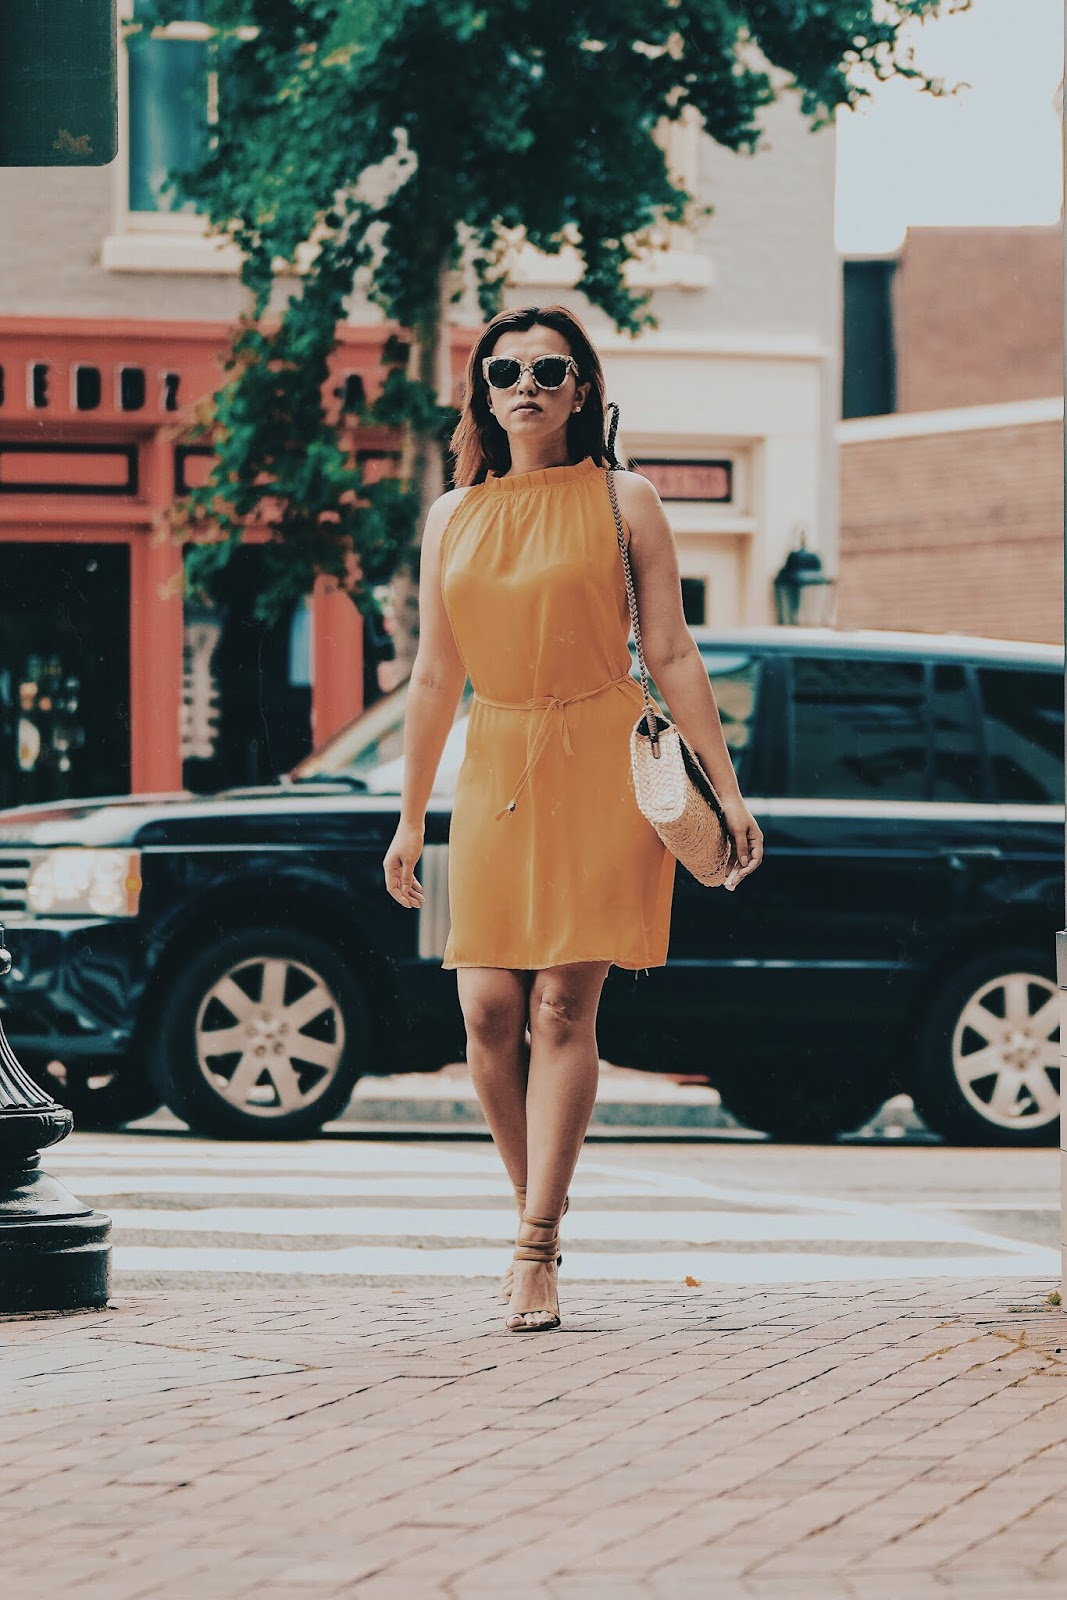 Back To The Beginning-mariestilo-lookoftheday-mural-georgetown-travelblogger-dcblogger-fashionblog-travelblog-vestidos-verano2018